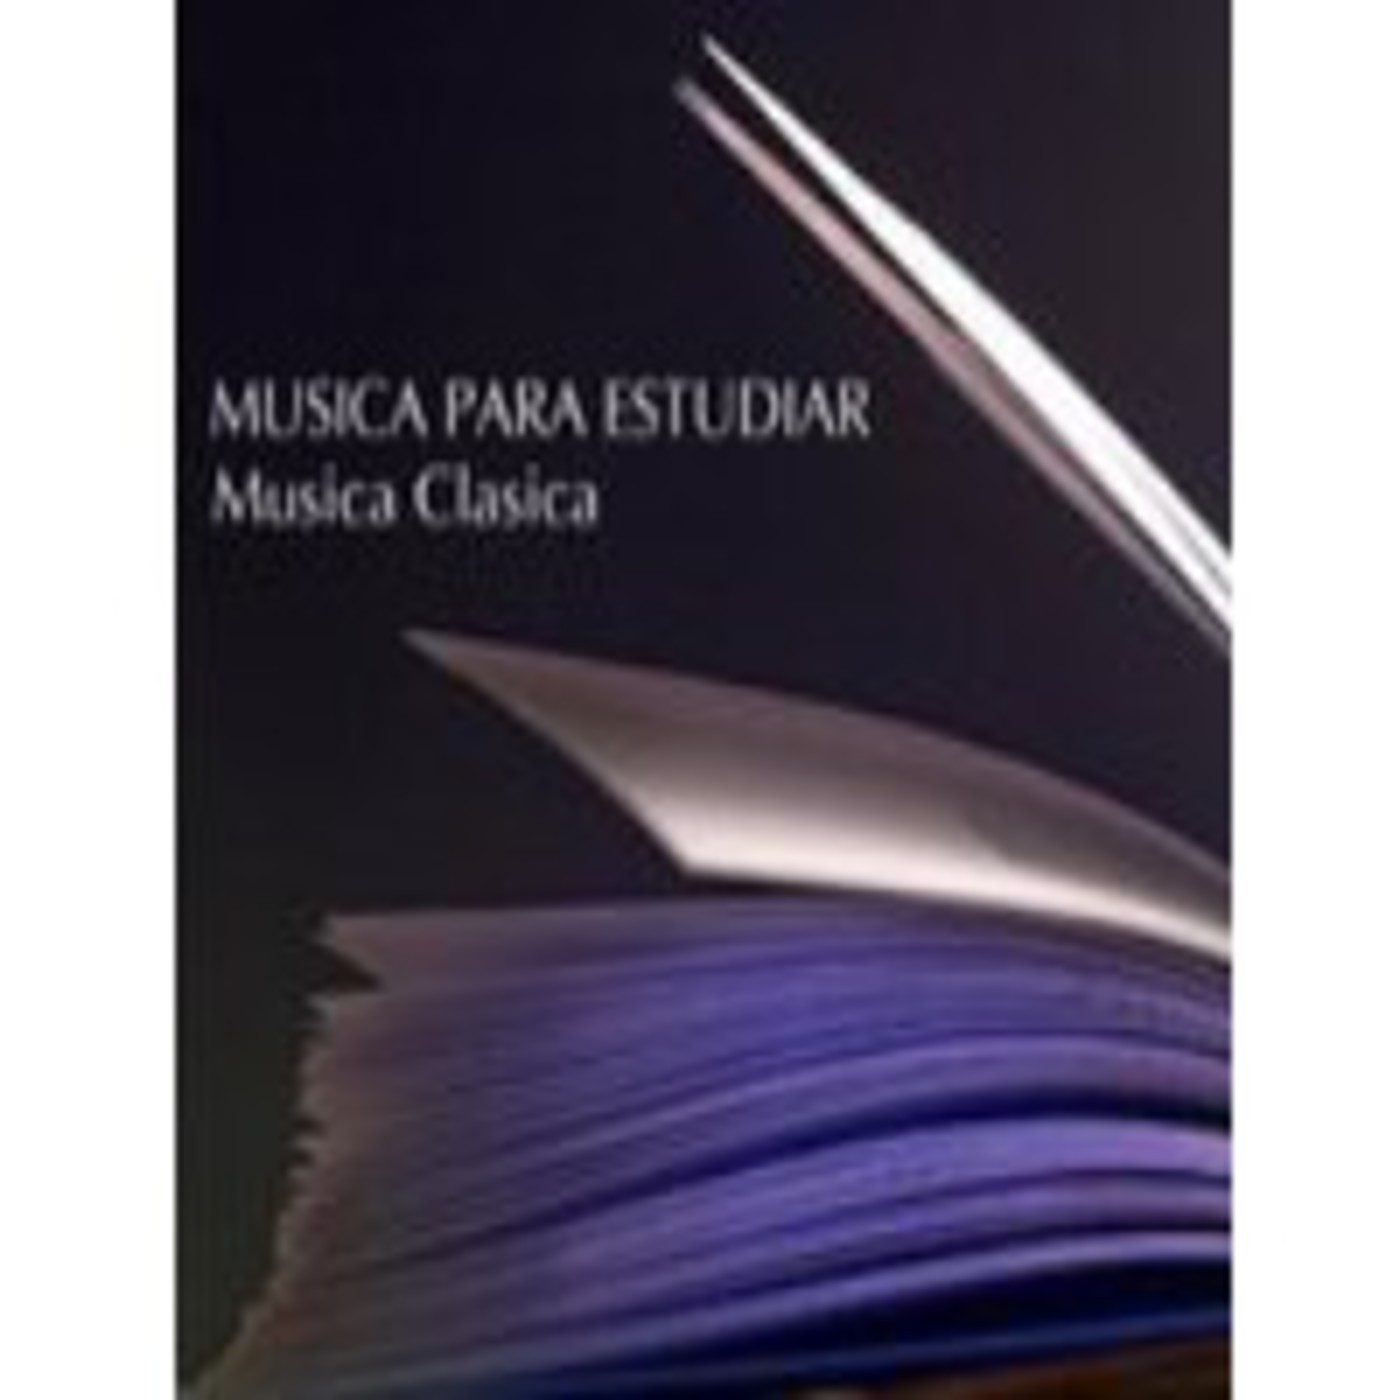 1 hora de m sica cl sica para estudiar en m sica cl sica for Musica clasica para entrenar